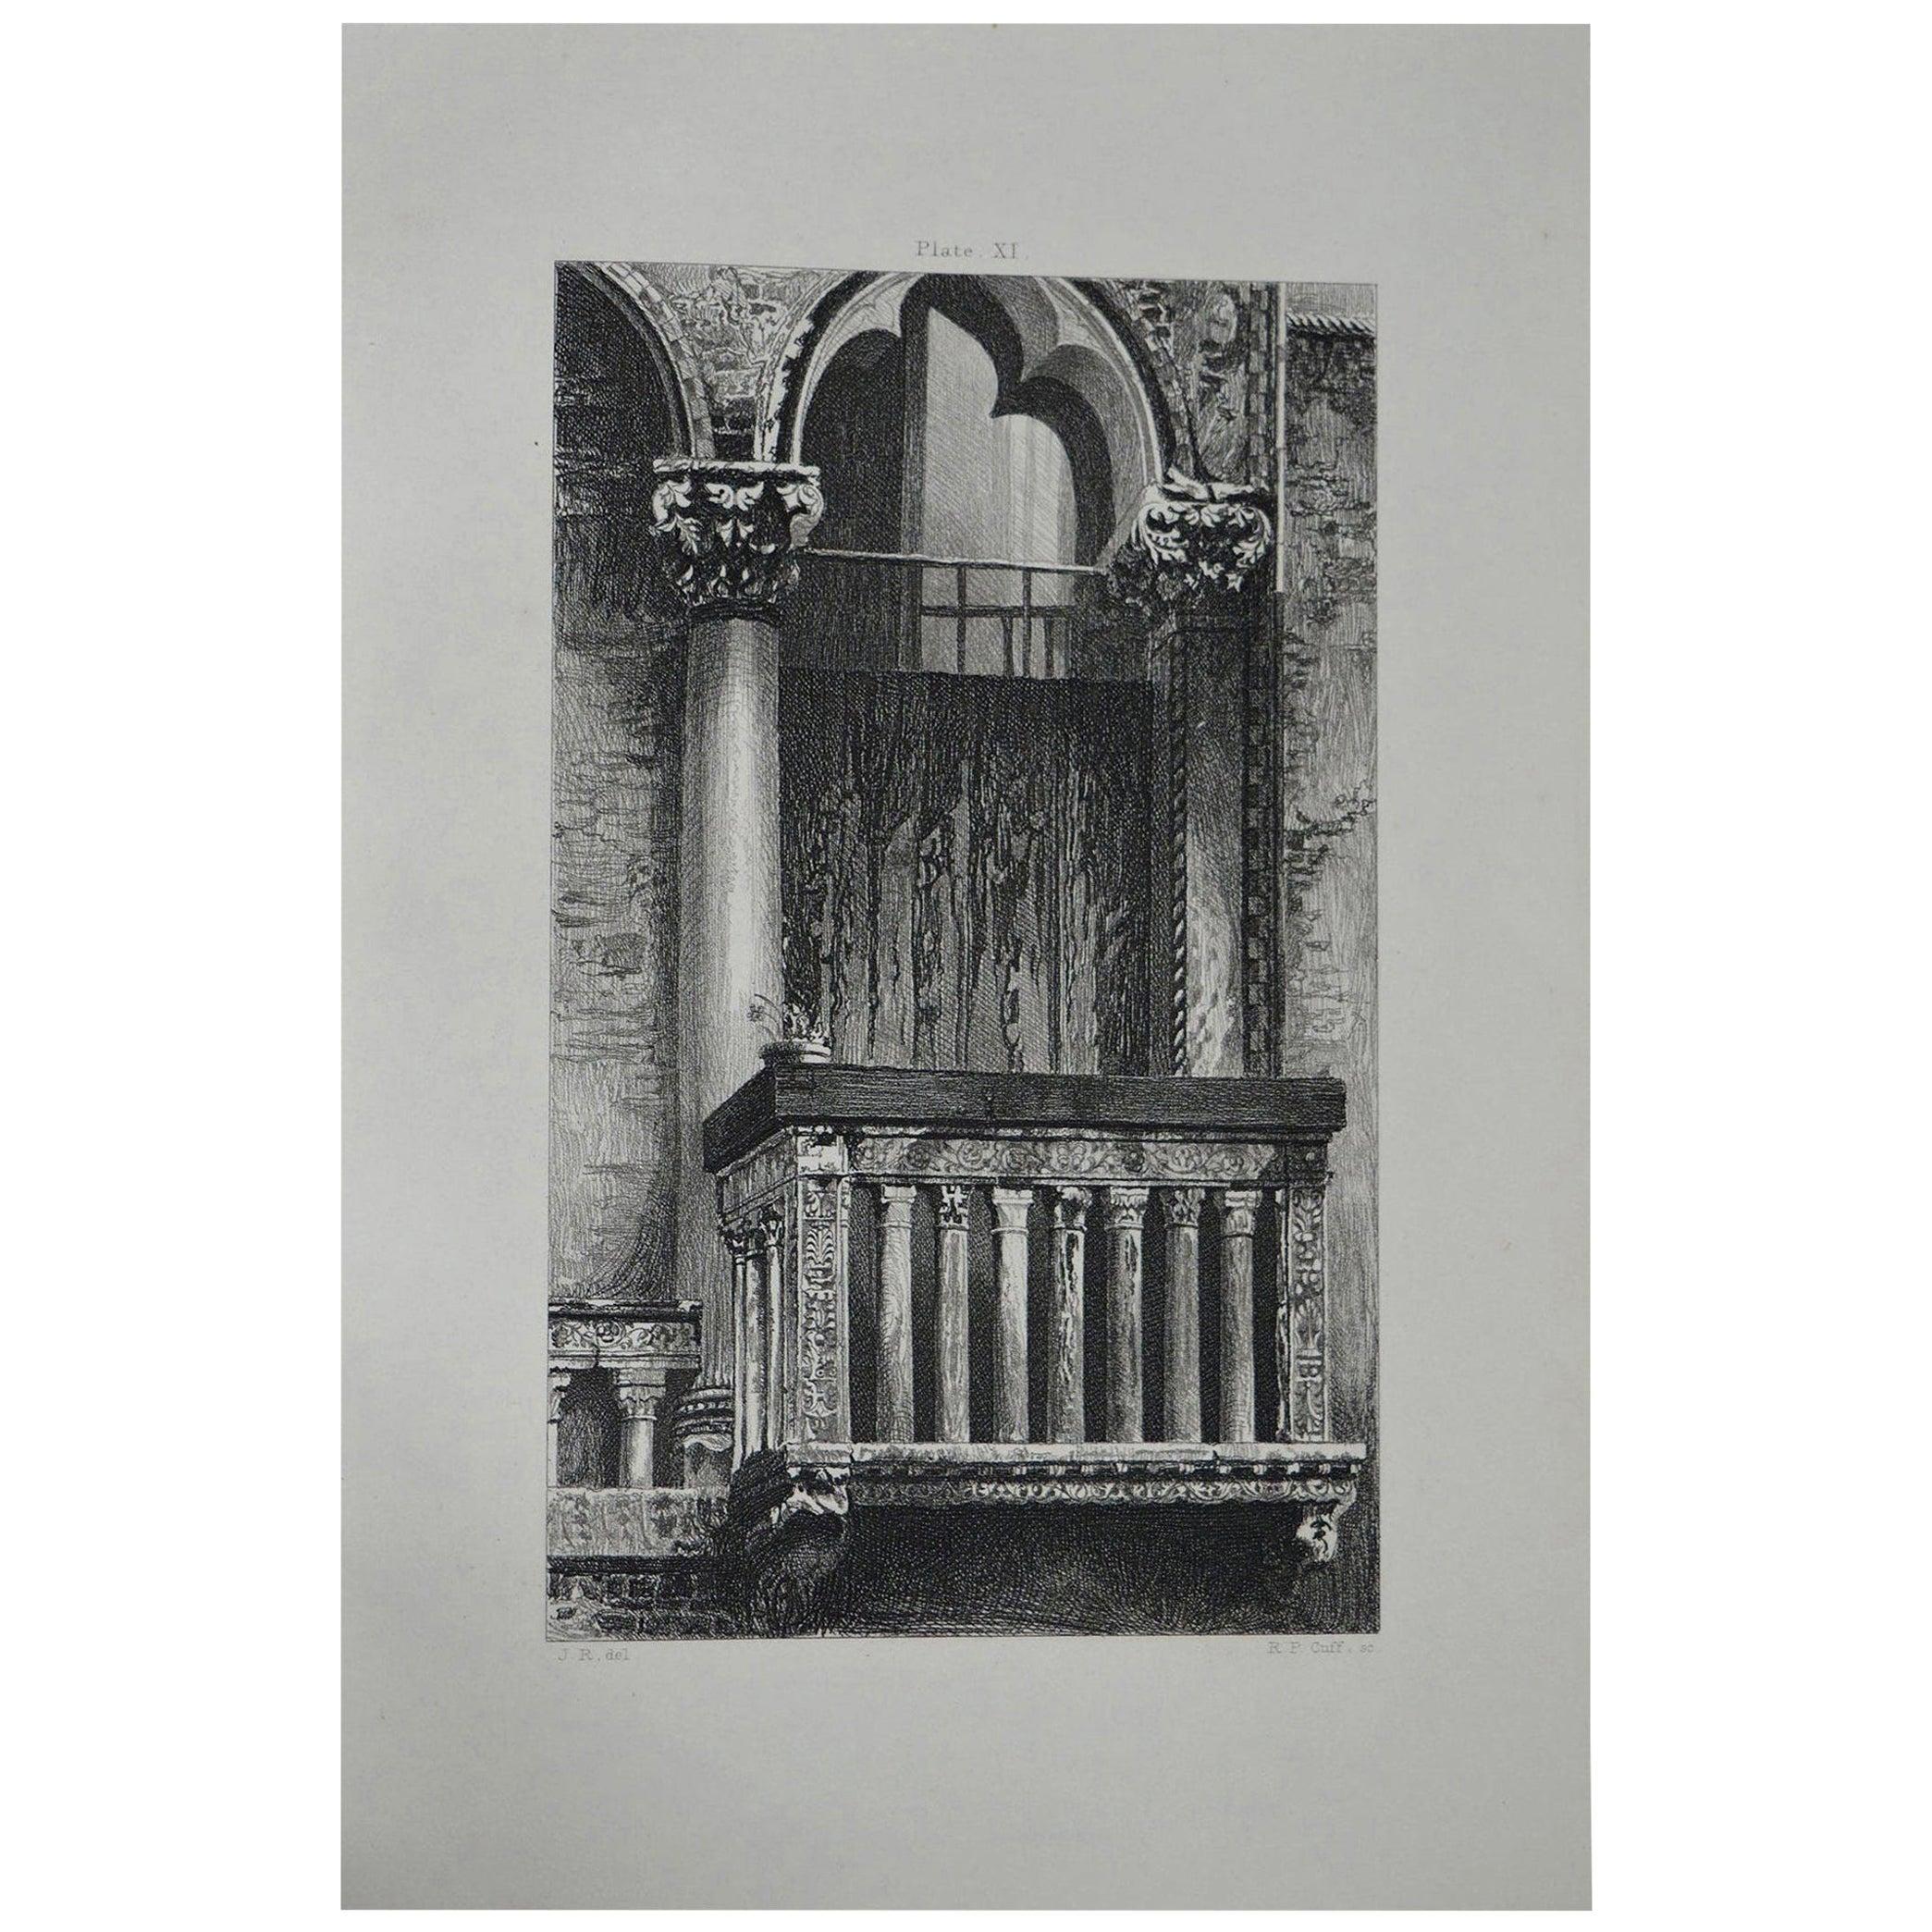 Original Antique Architectural Print by John Ruskin, circa 1880, 'Venice'